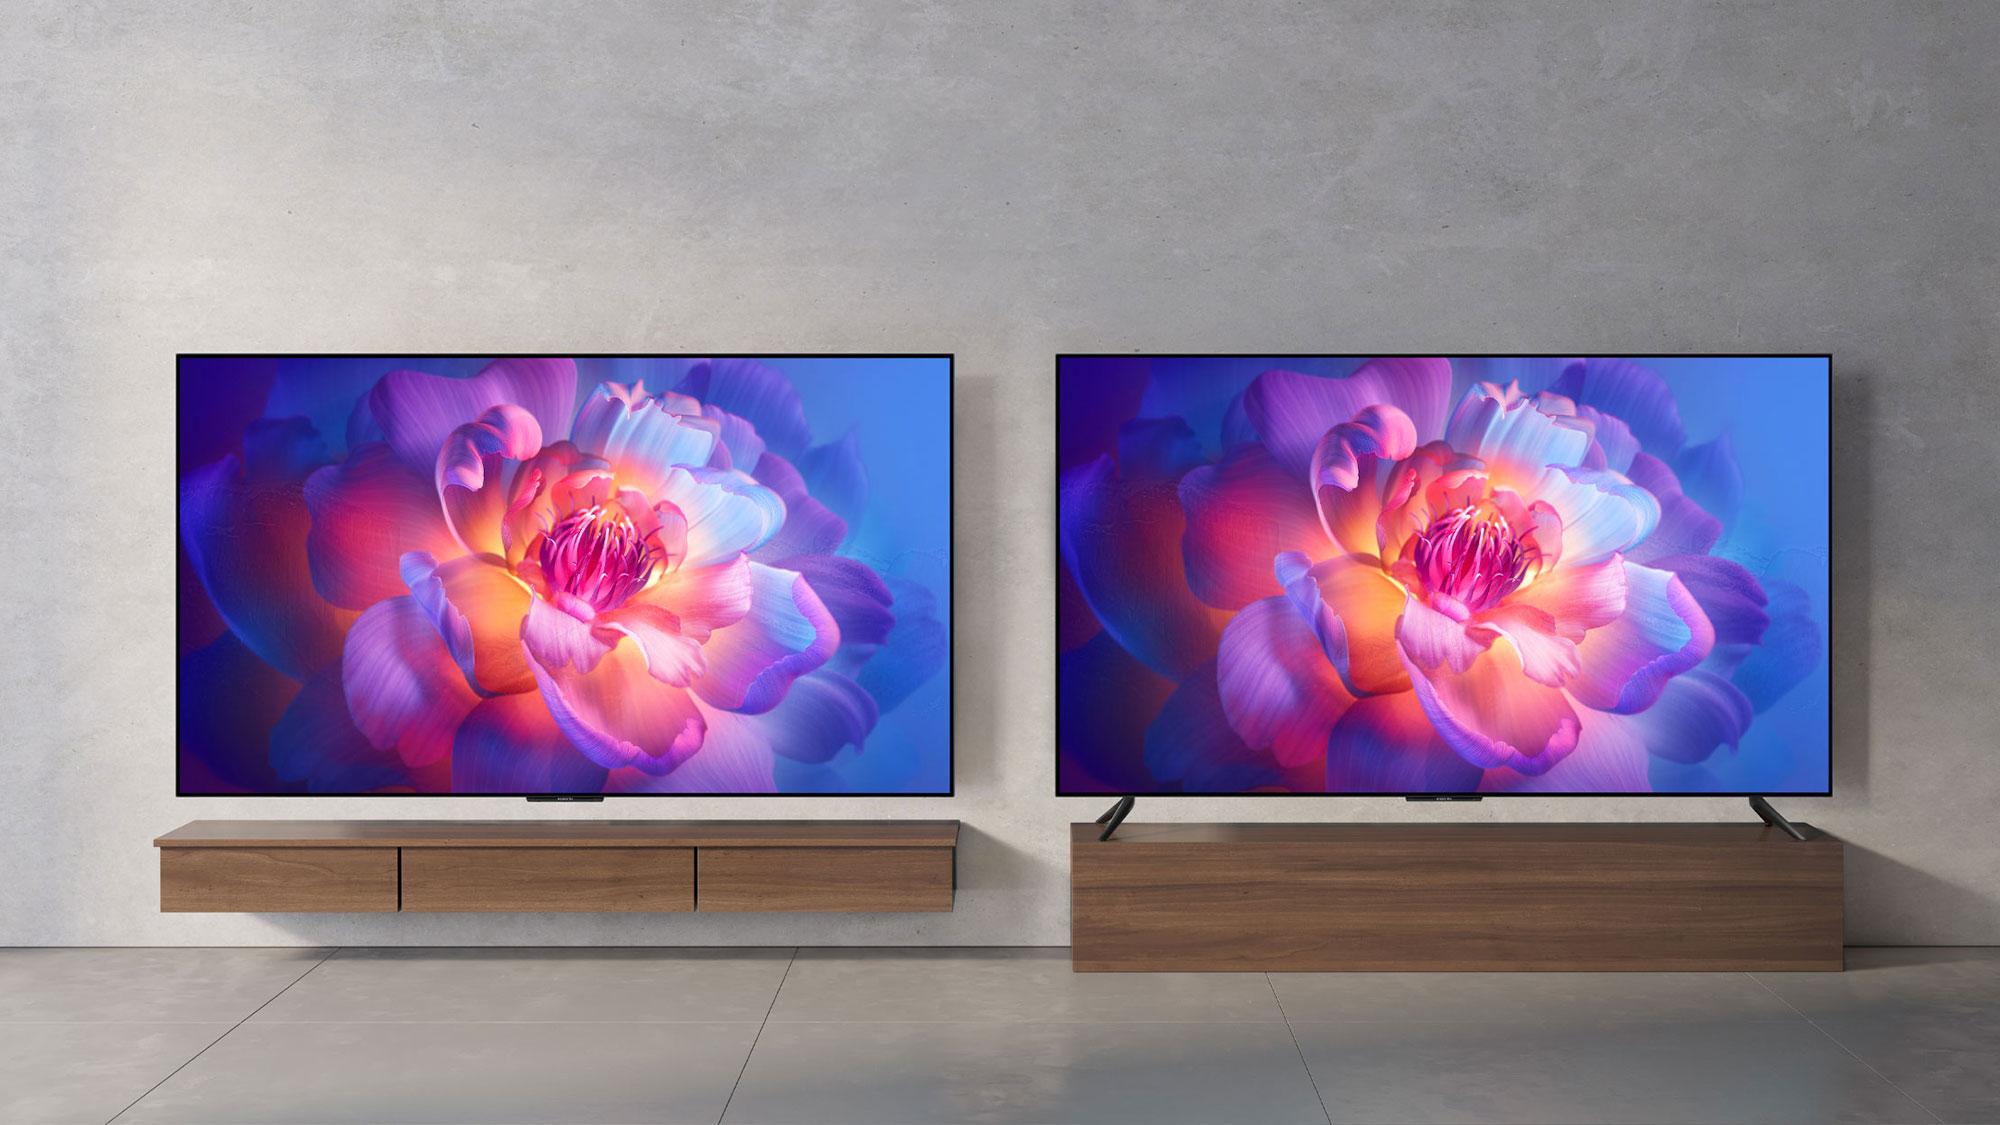 Xiaomi Mi TV 6 Series TV